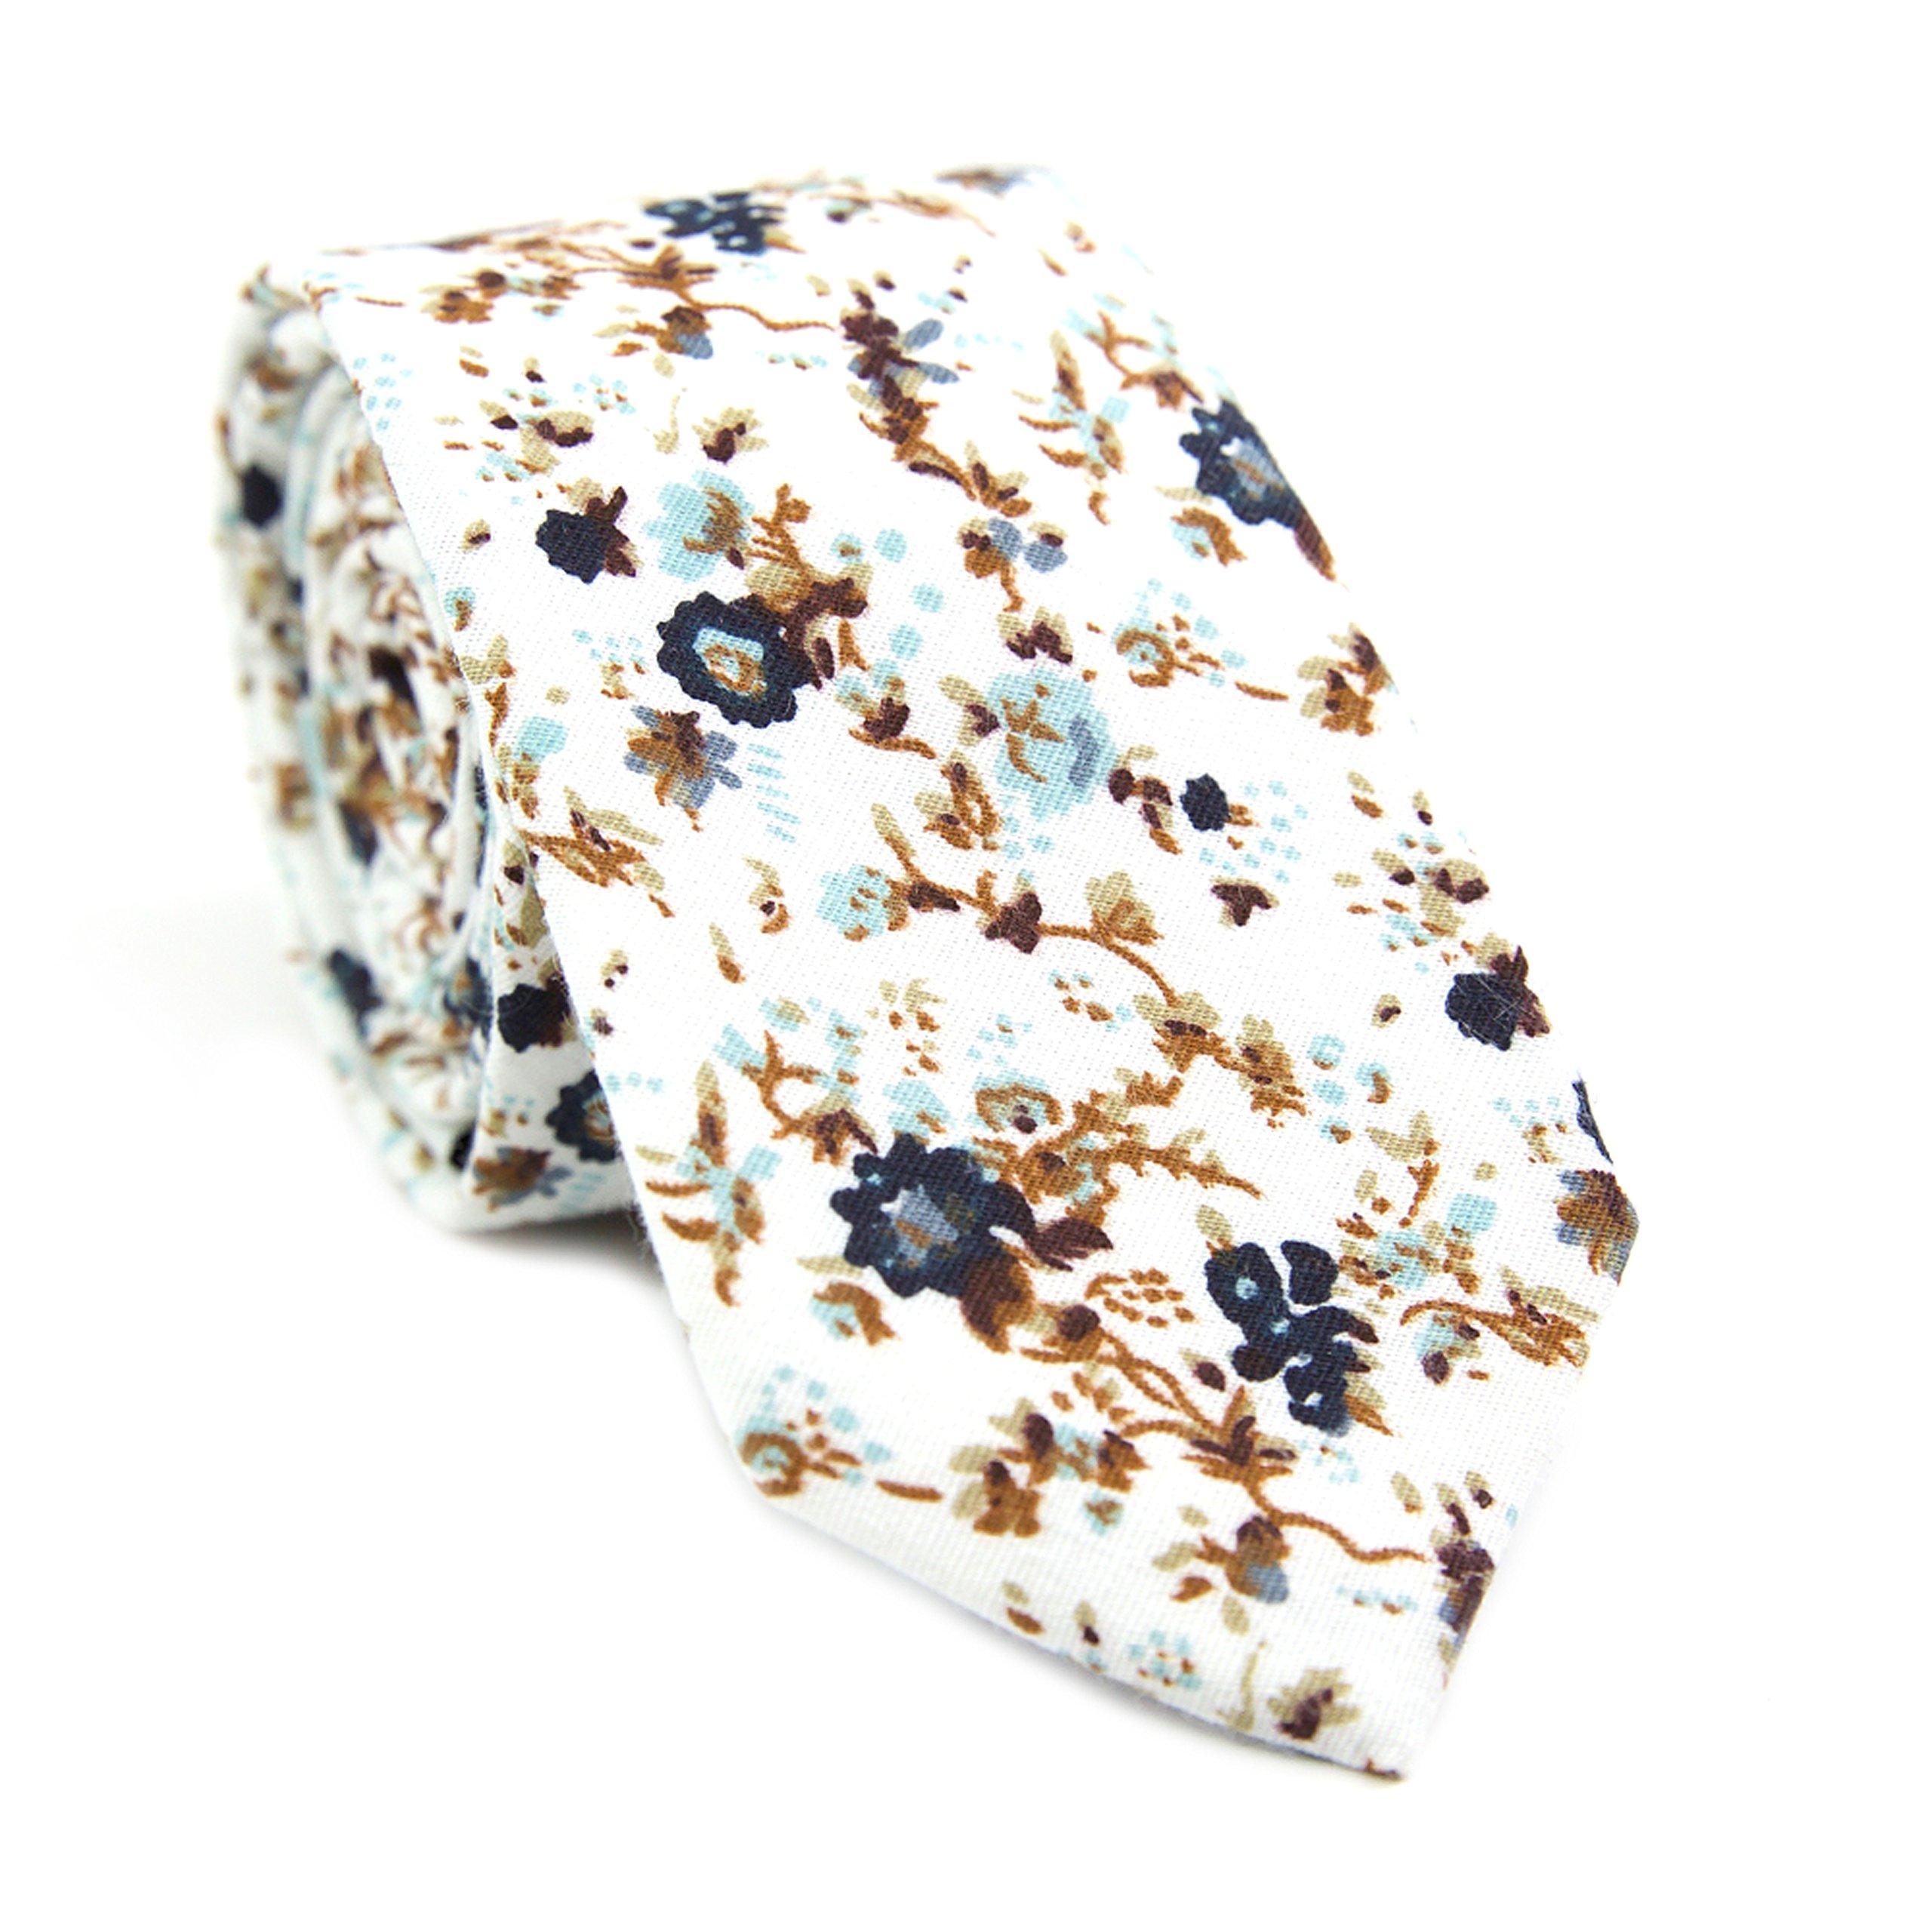 DAZI Men's Skinny Tie Floral Print Cotton Necktie, Great for Weddings, Groom, Groomsmen, Missions, Dances, Gifts. (Blue Bloom)